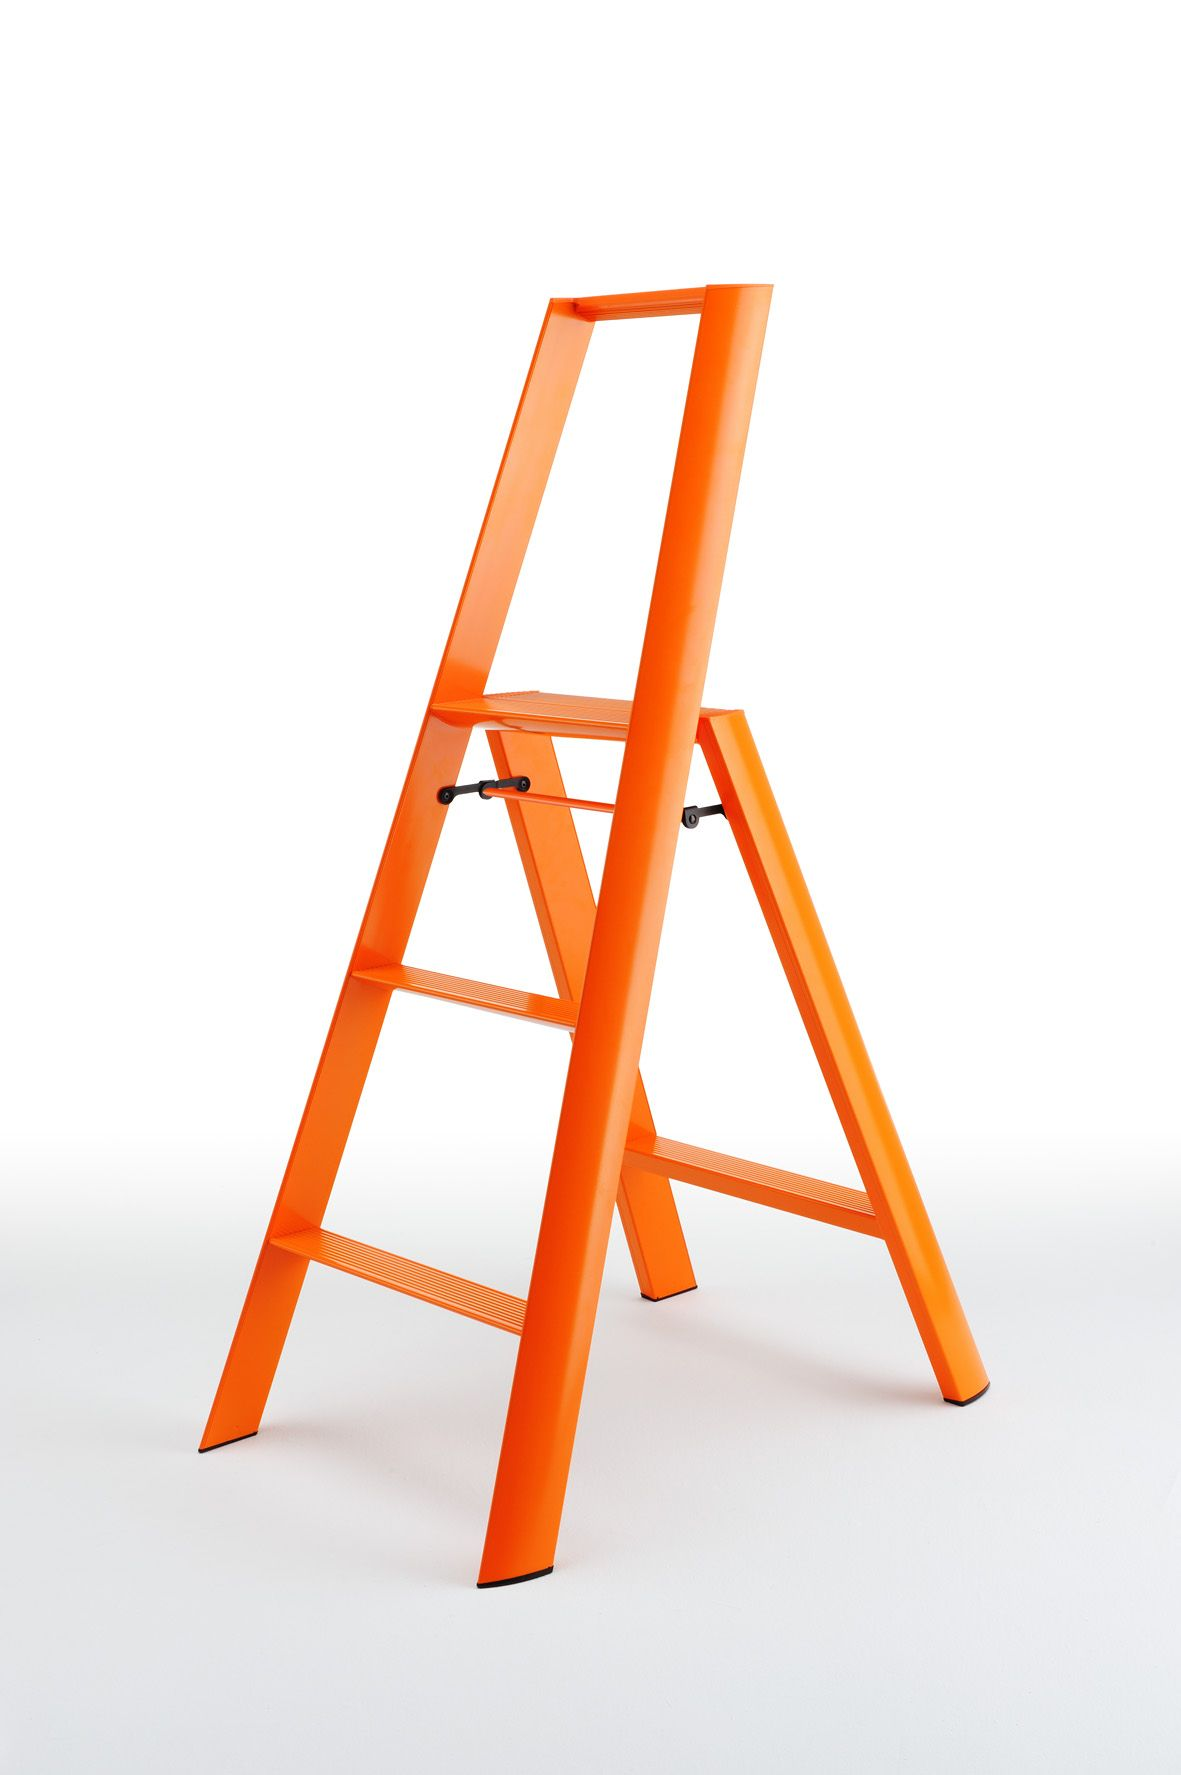 Lucano Step Stools Lucano 3 Step Step Stool Step Ladders Plastic Step Stool